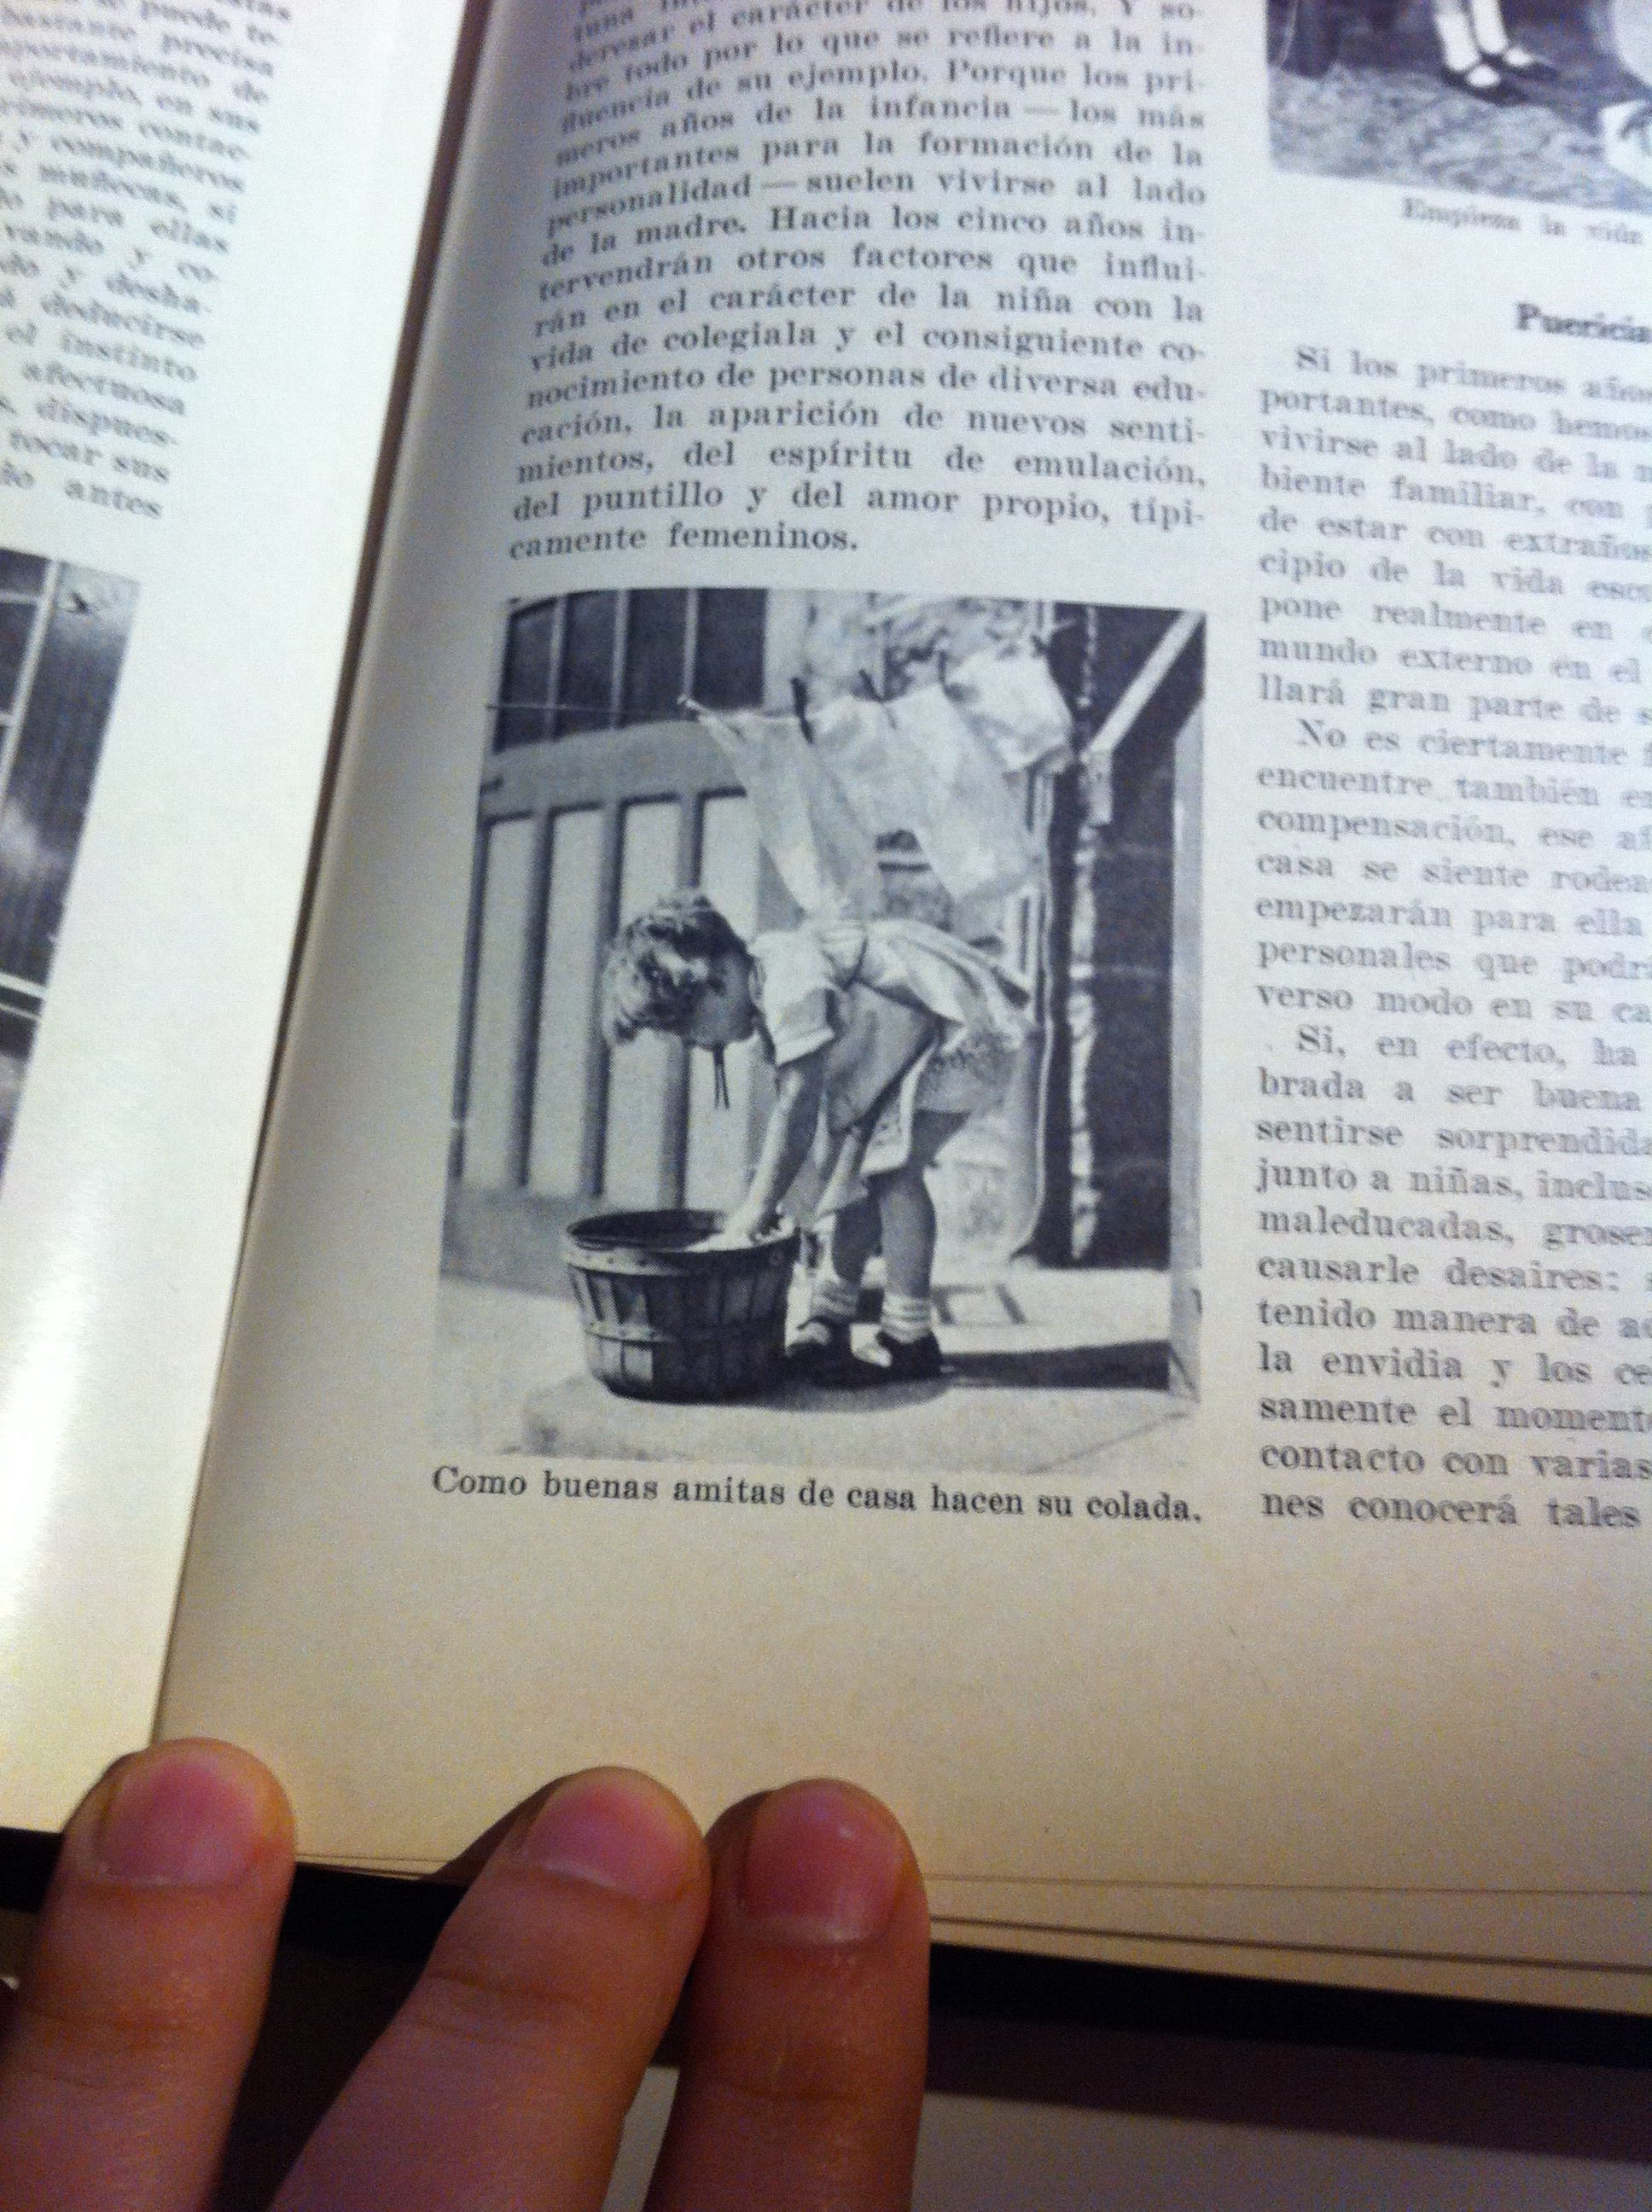 Enciclopedia Moderna Femenina, 1958.